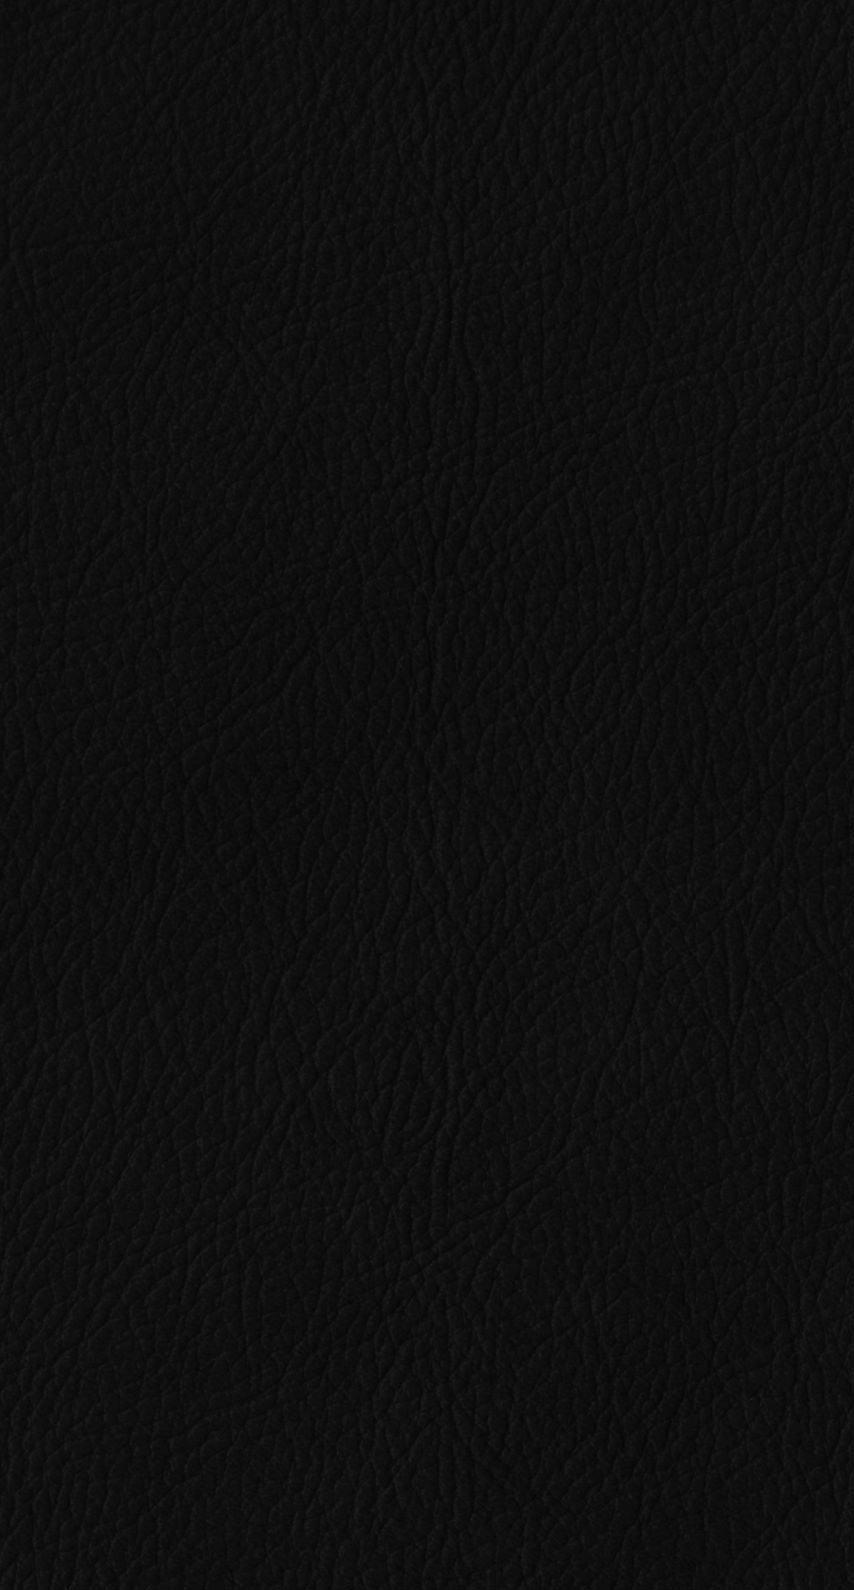 Wallpaper iphone hitam - Black Iphone7 Wallpaper